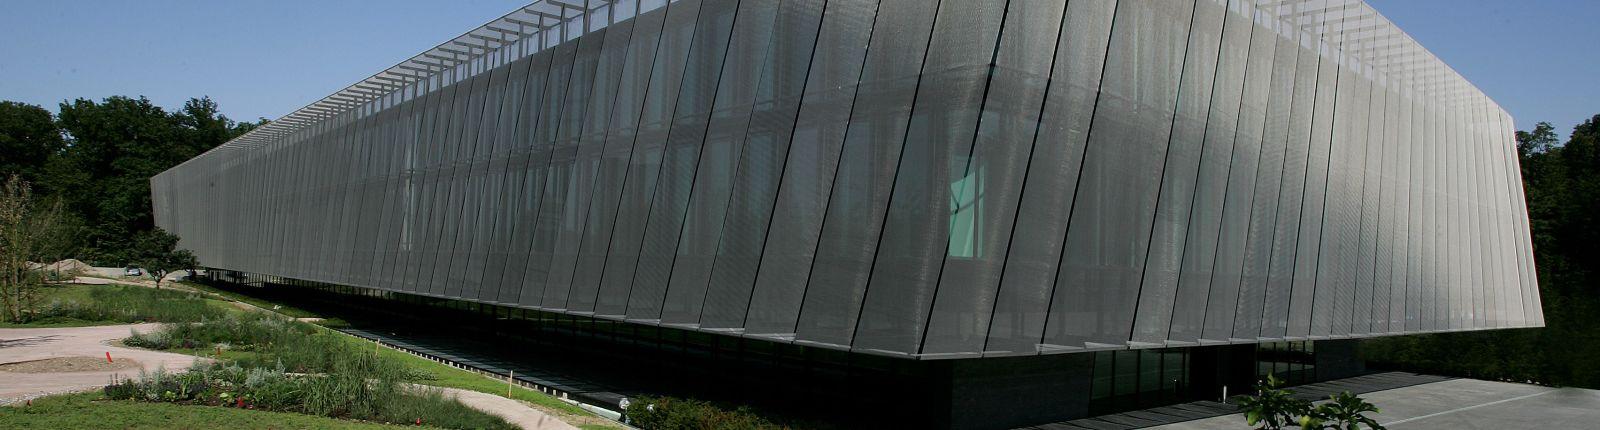 Architekturgewebefassade am FIFA-Hauptsitz